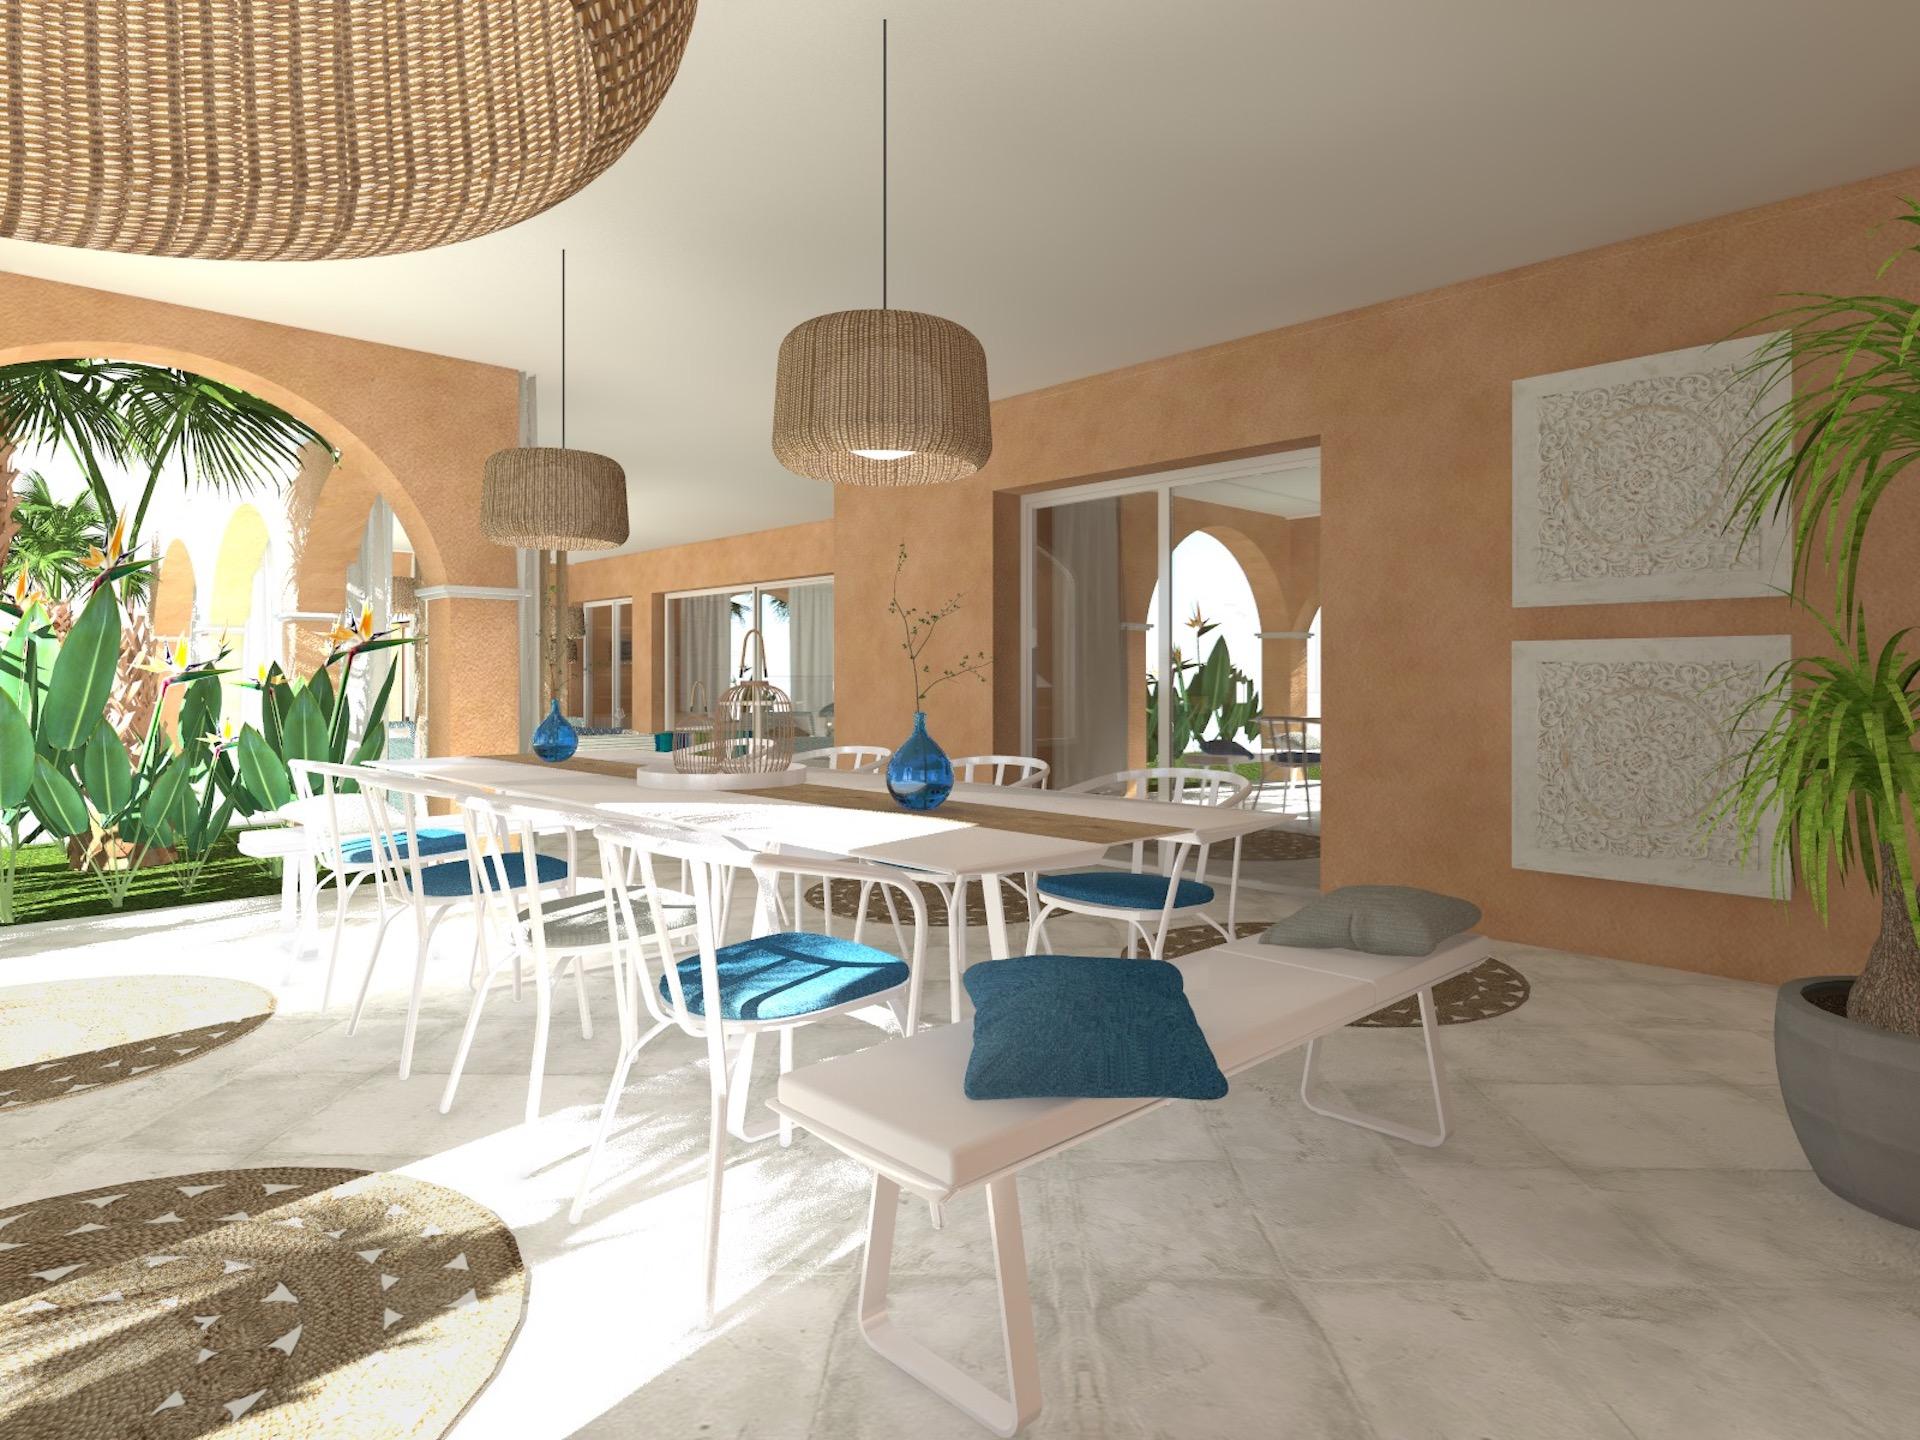 renovation villa luxe semaphore sainte-maxime var architecture interieure31